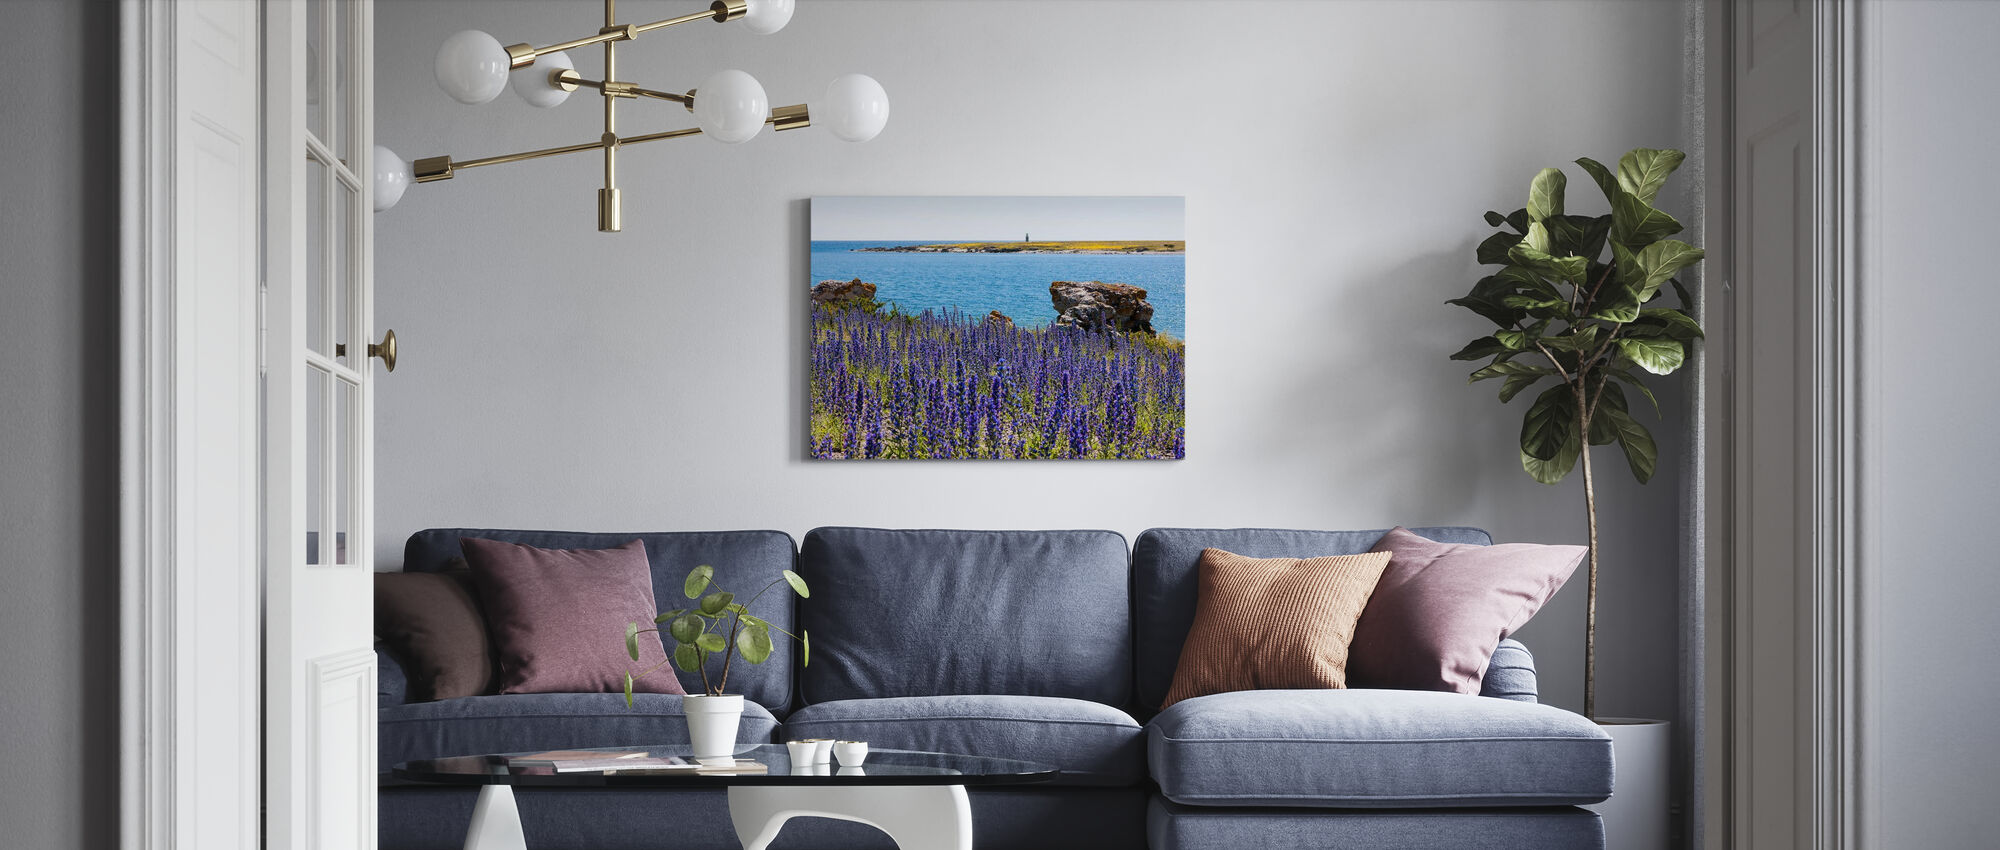 Gotlands Sommarlandskap - Canvastavla - Vardagsrum